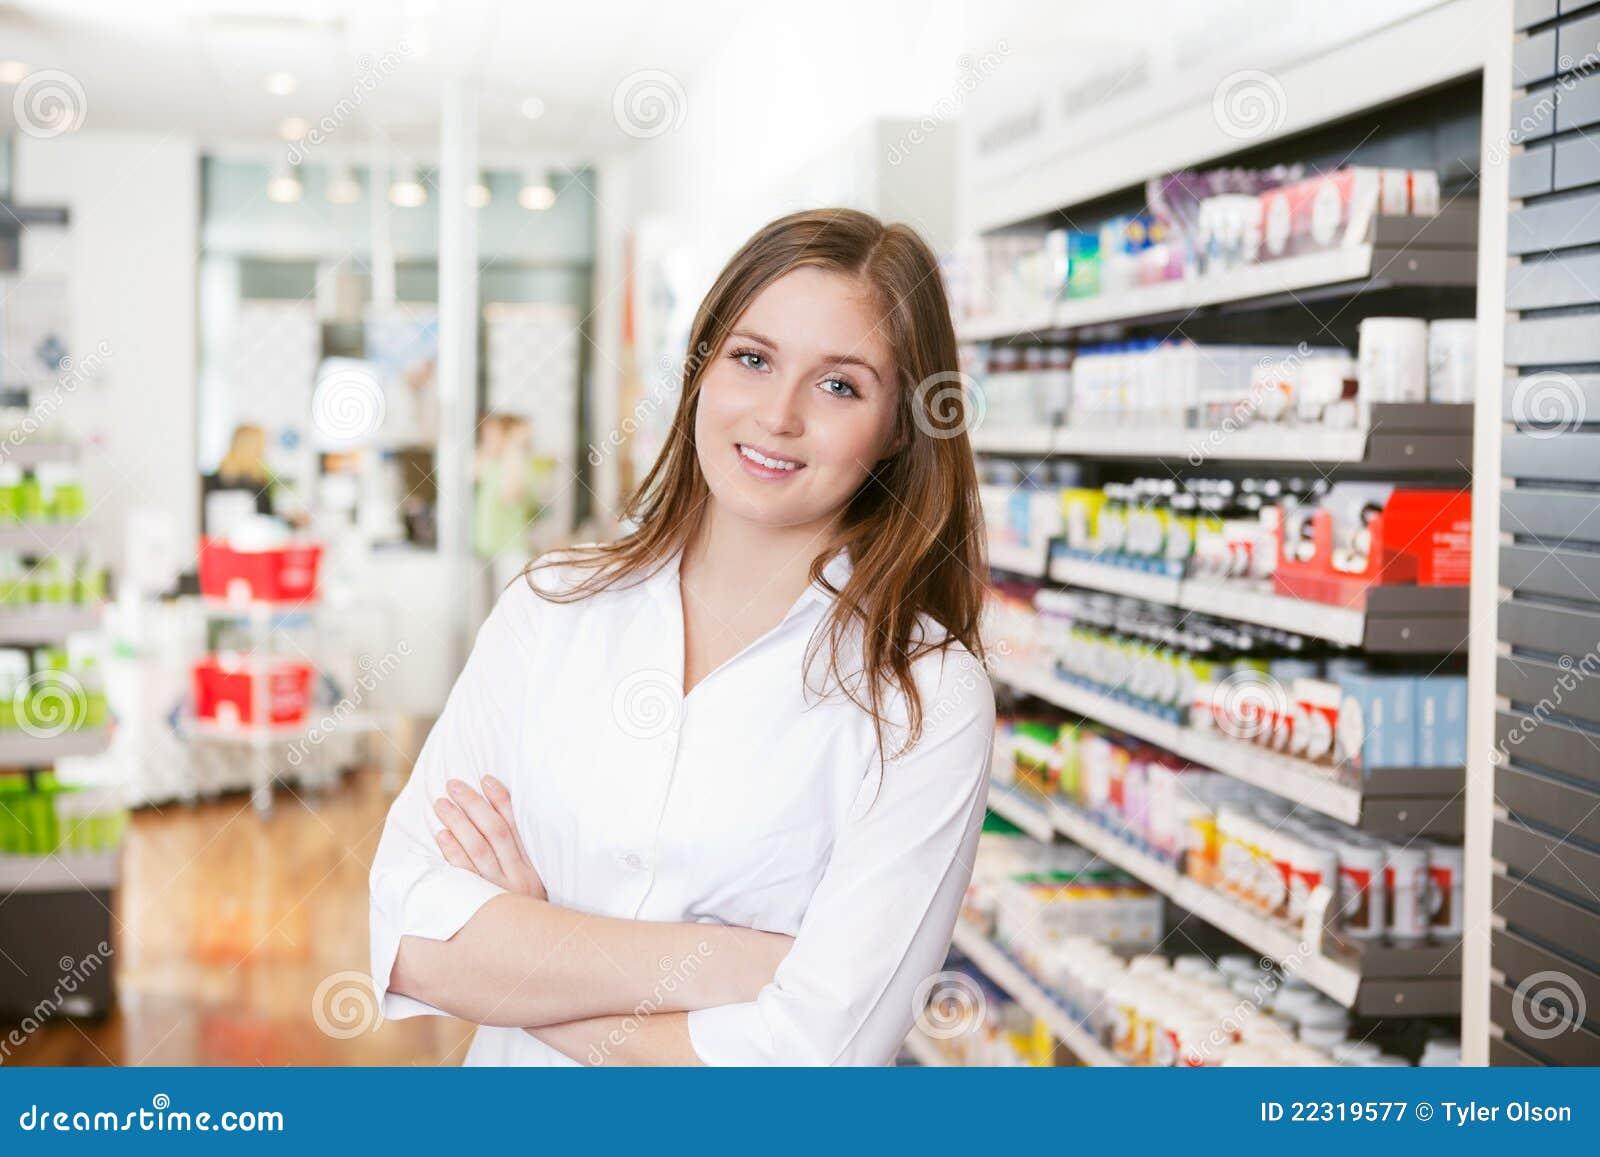 Female erectile dysfunction symptoms letra